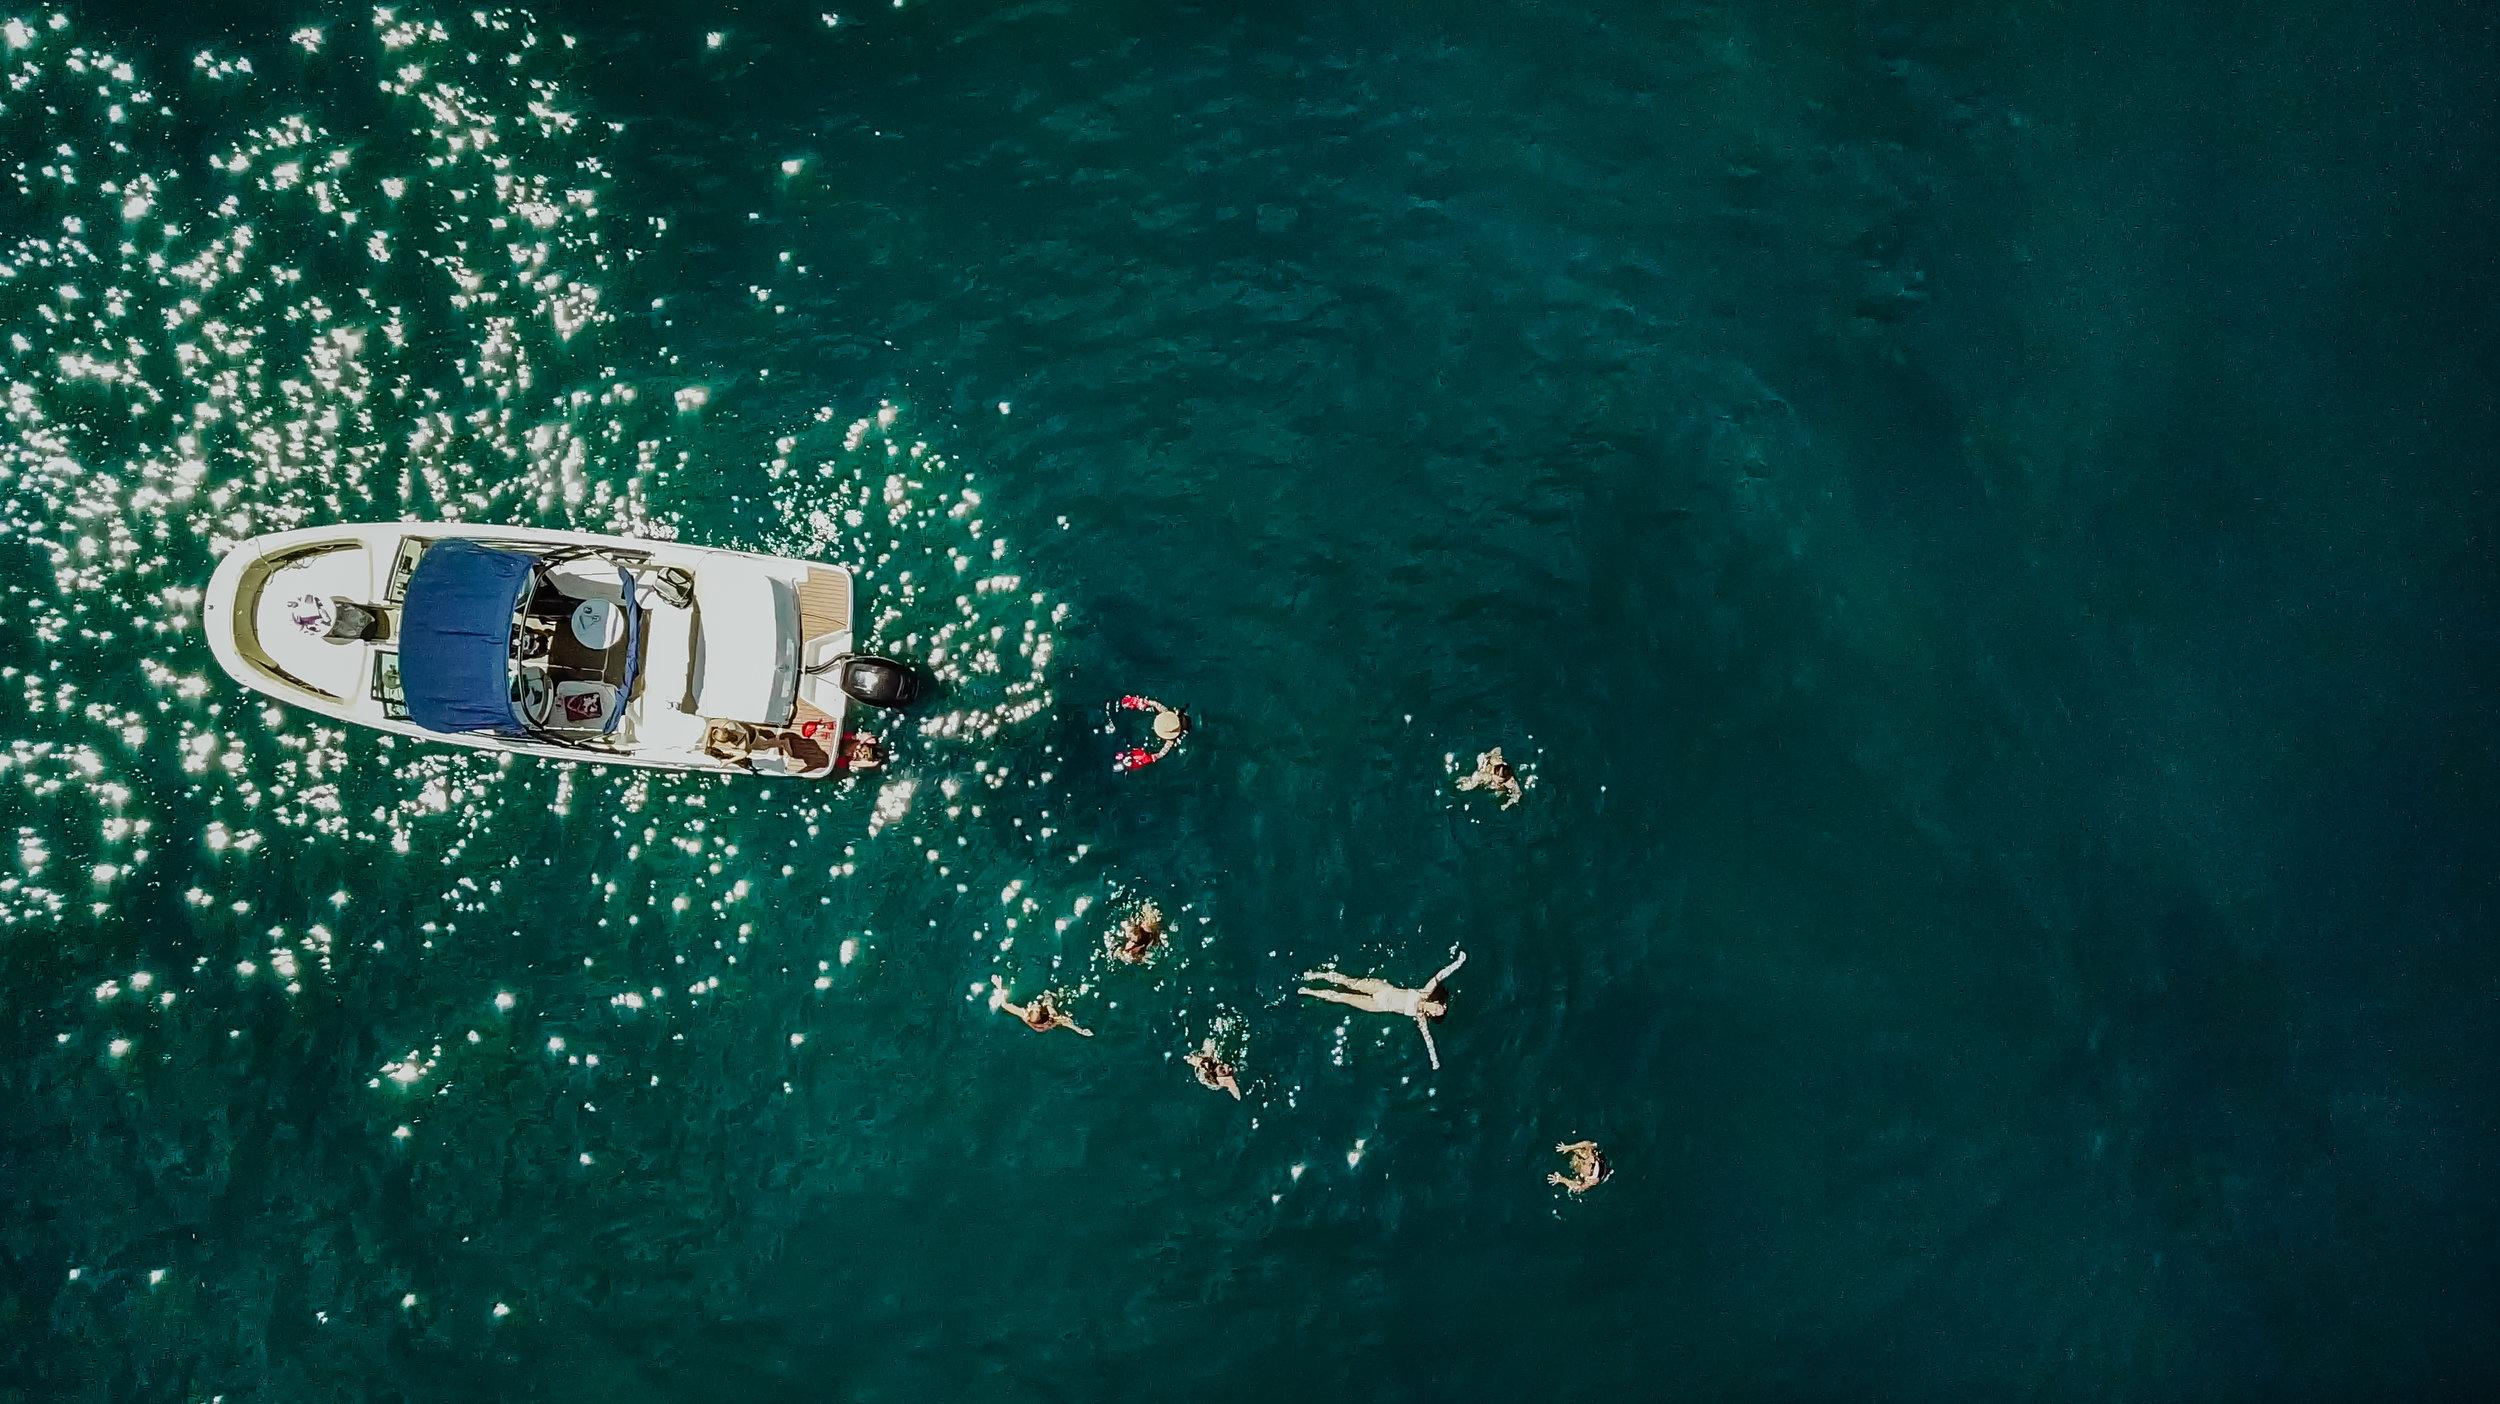 ElyseCosgrove-Drone-Photographer-Tahoe-201-2.jpg